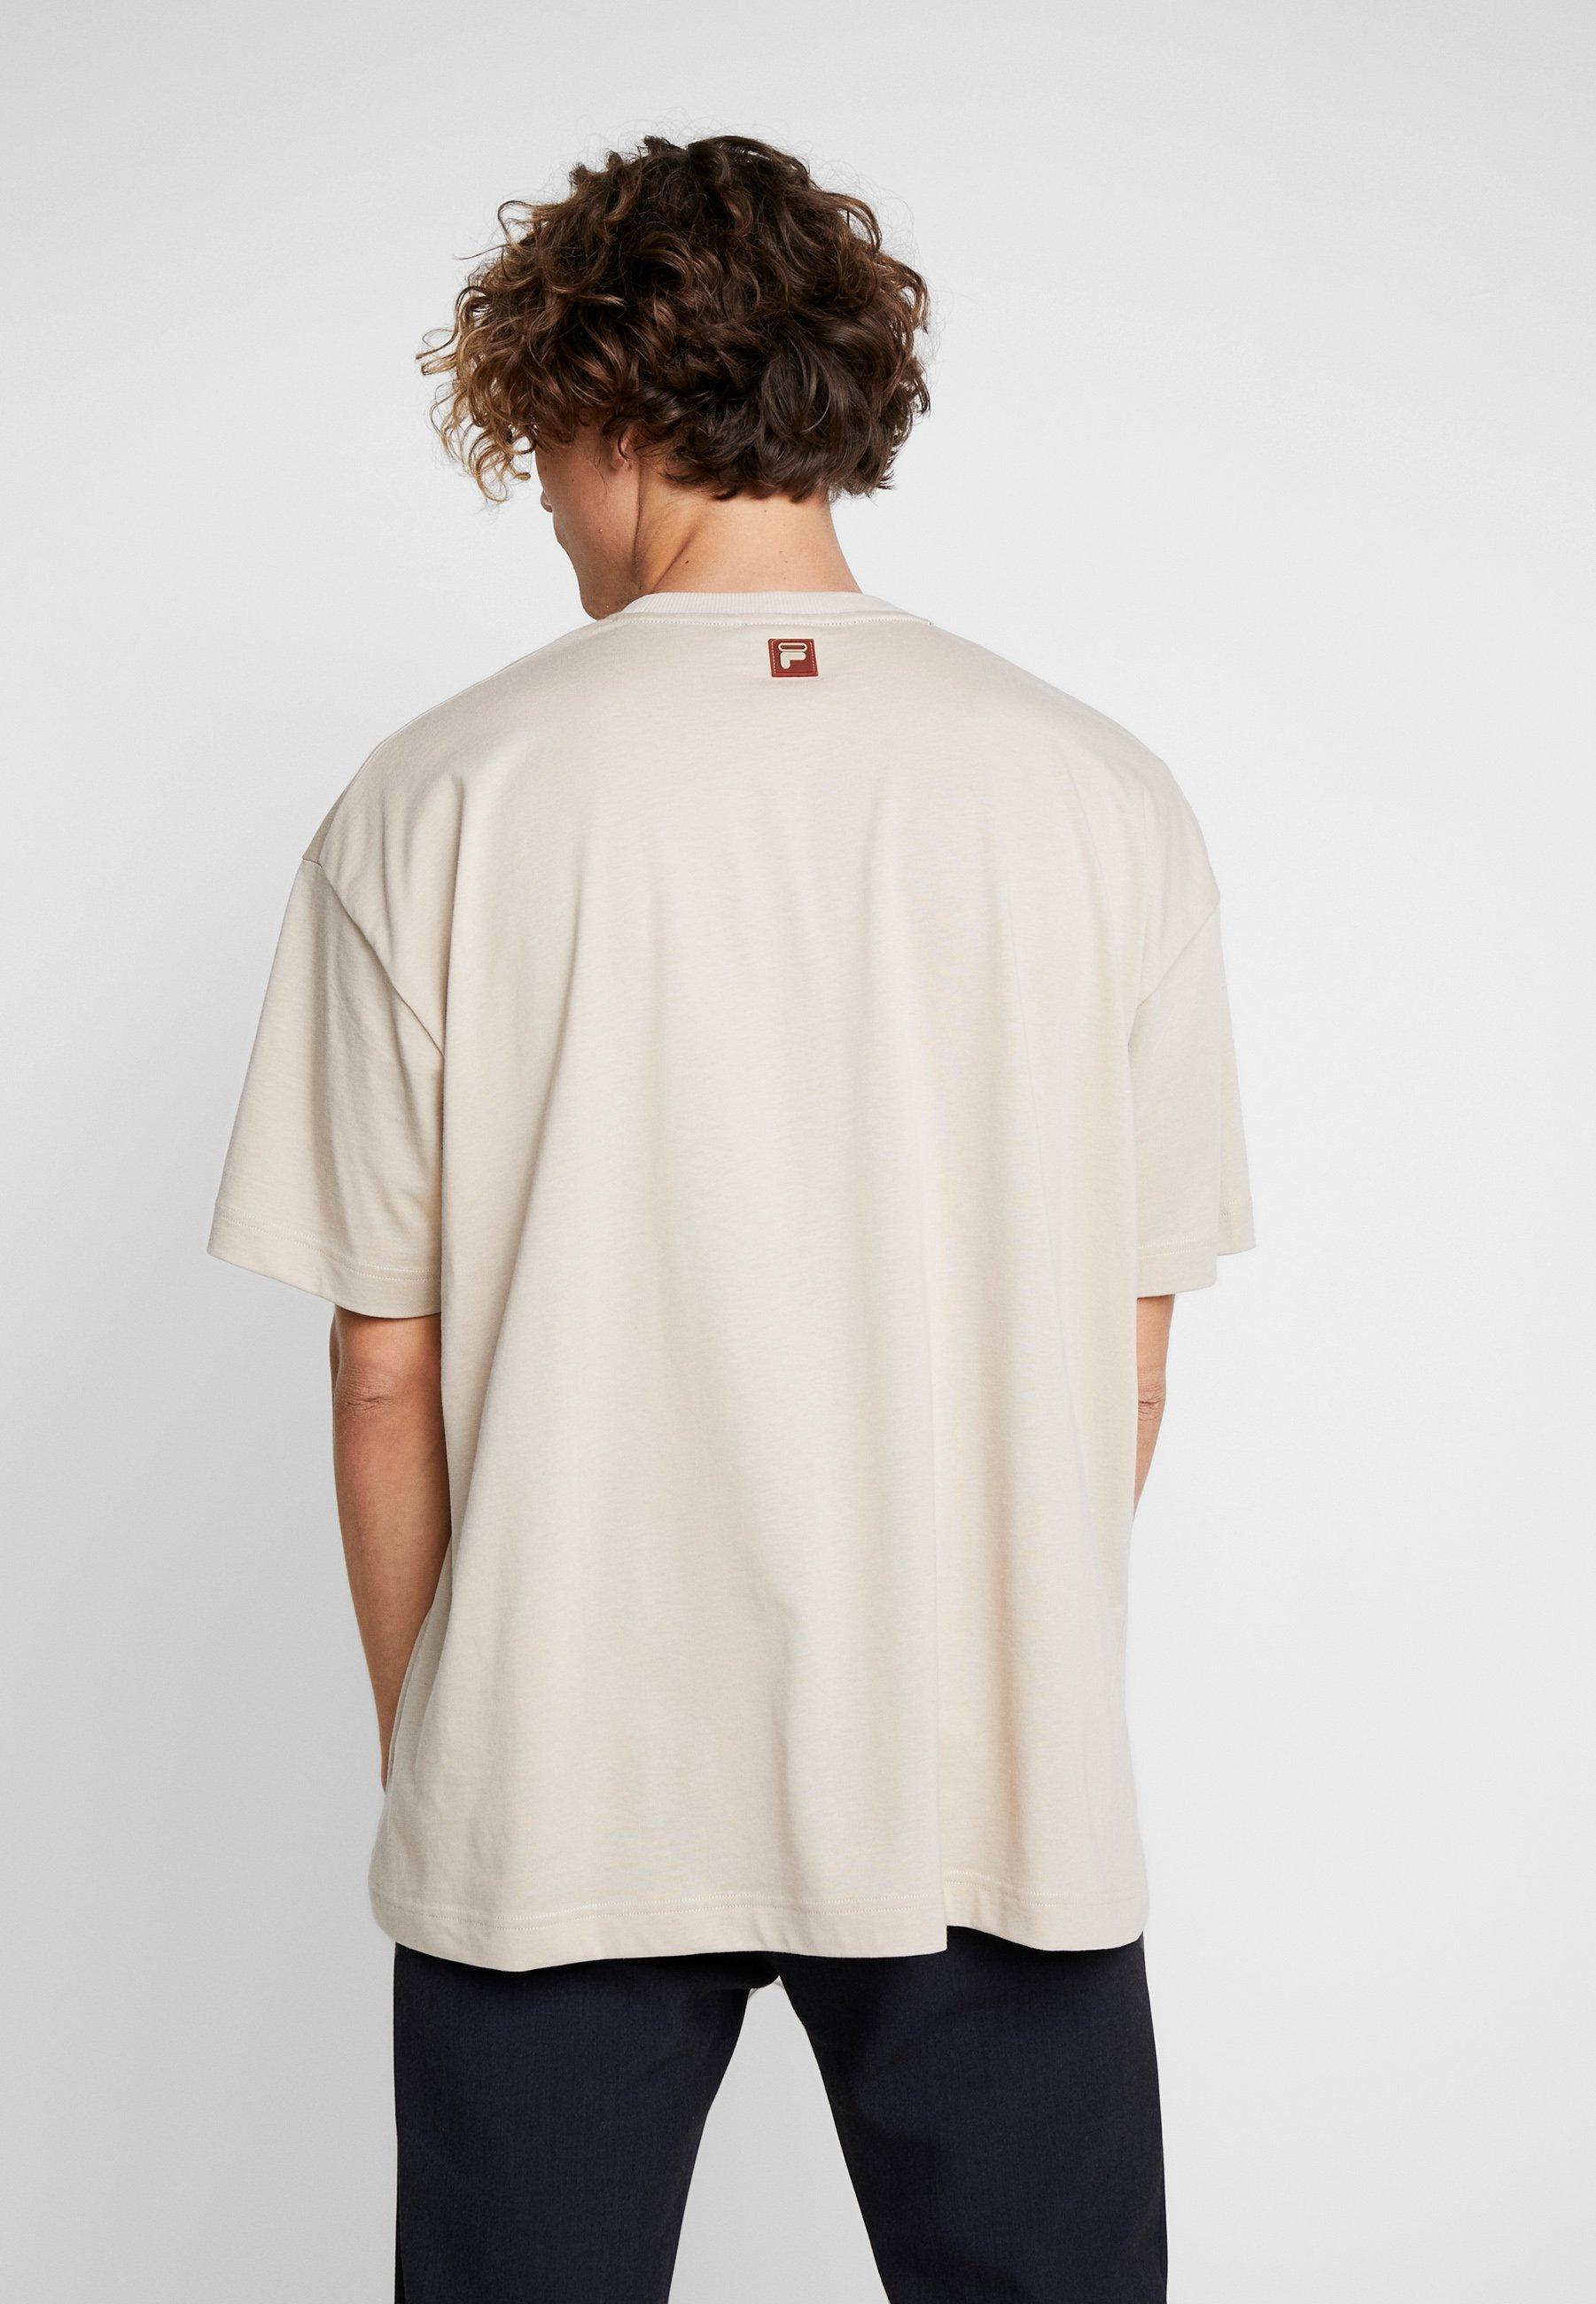 Basique For shirt Fila Weekday Oxford Tan KianT 9YEDH2eWI